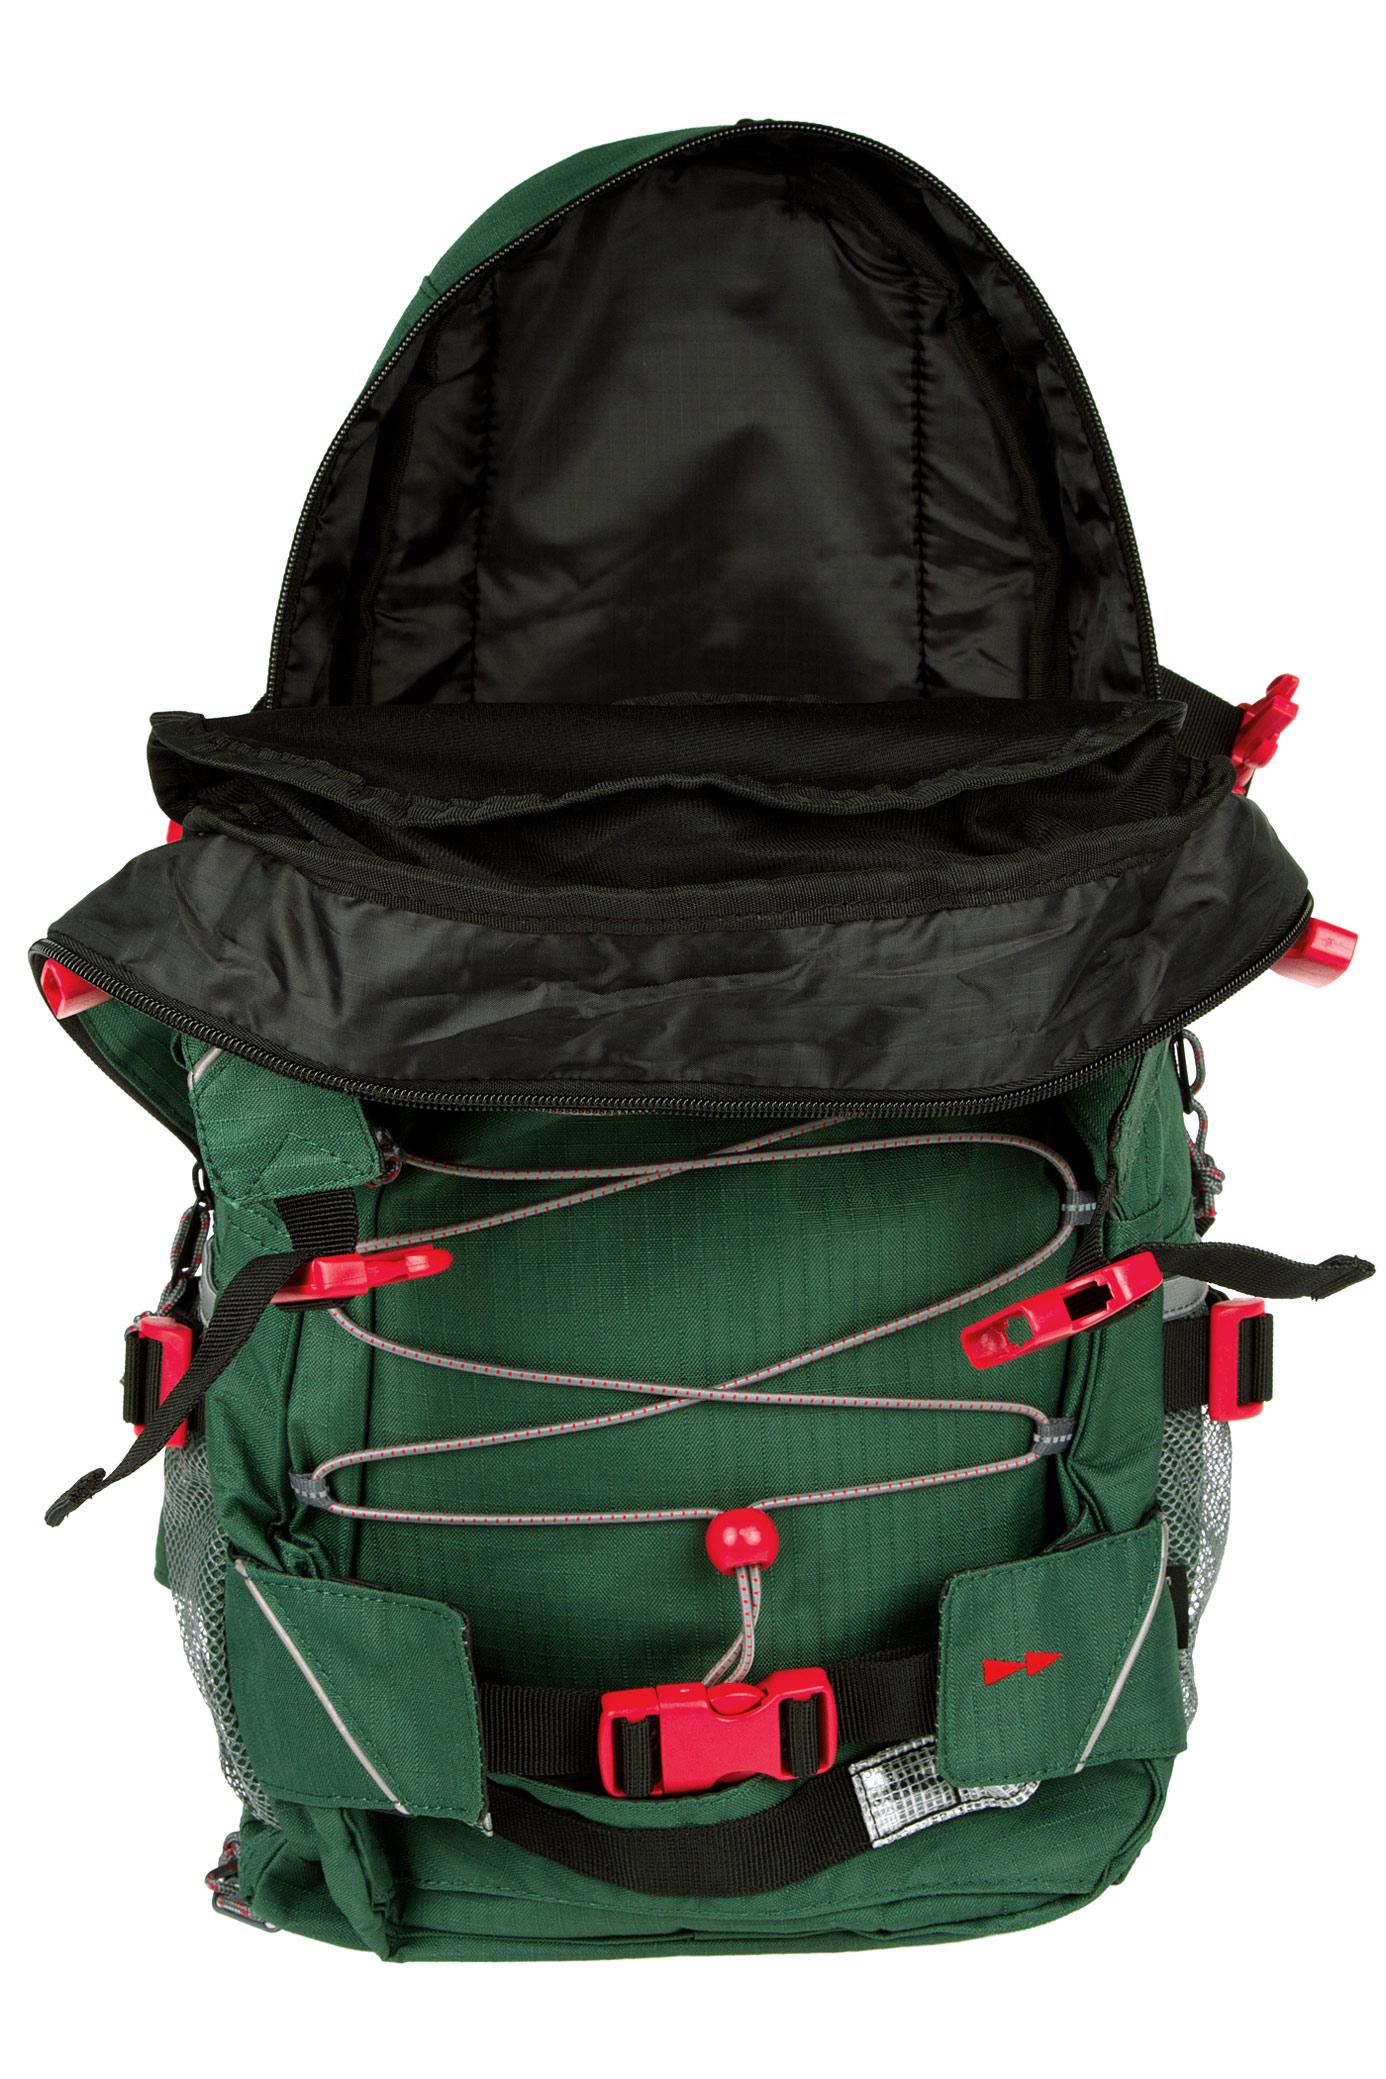 forvert ripstop louis backpack 20l green buy at skatedeluxe. Black Bedroom Furniture Sets. Home Design Ideas